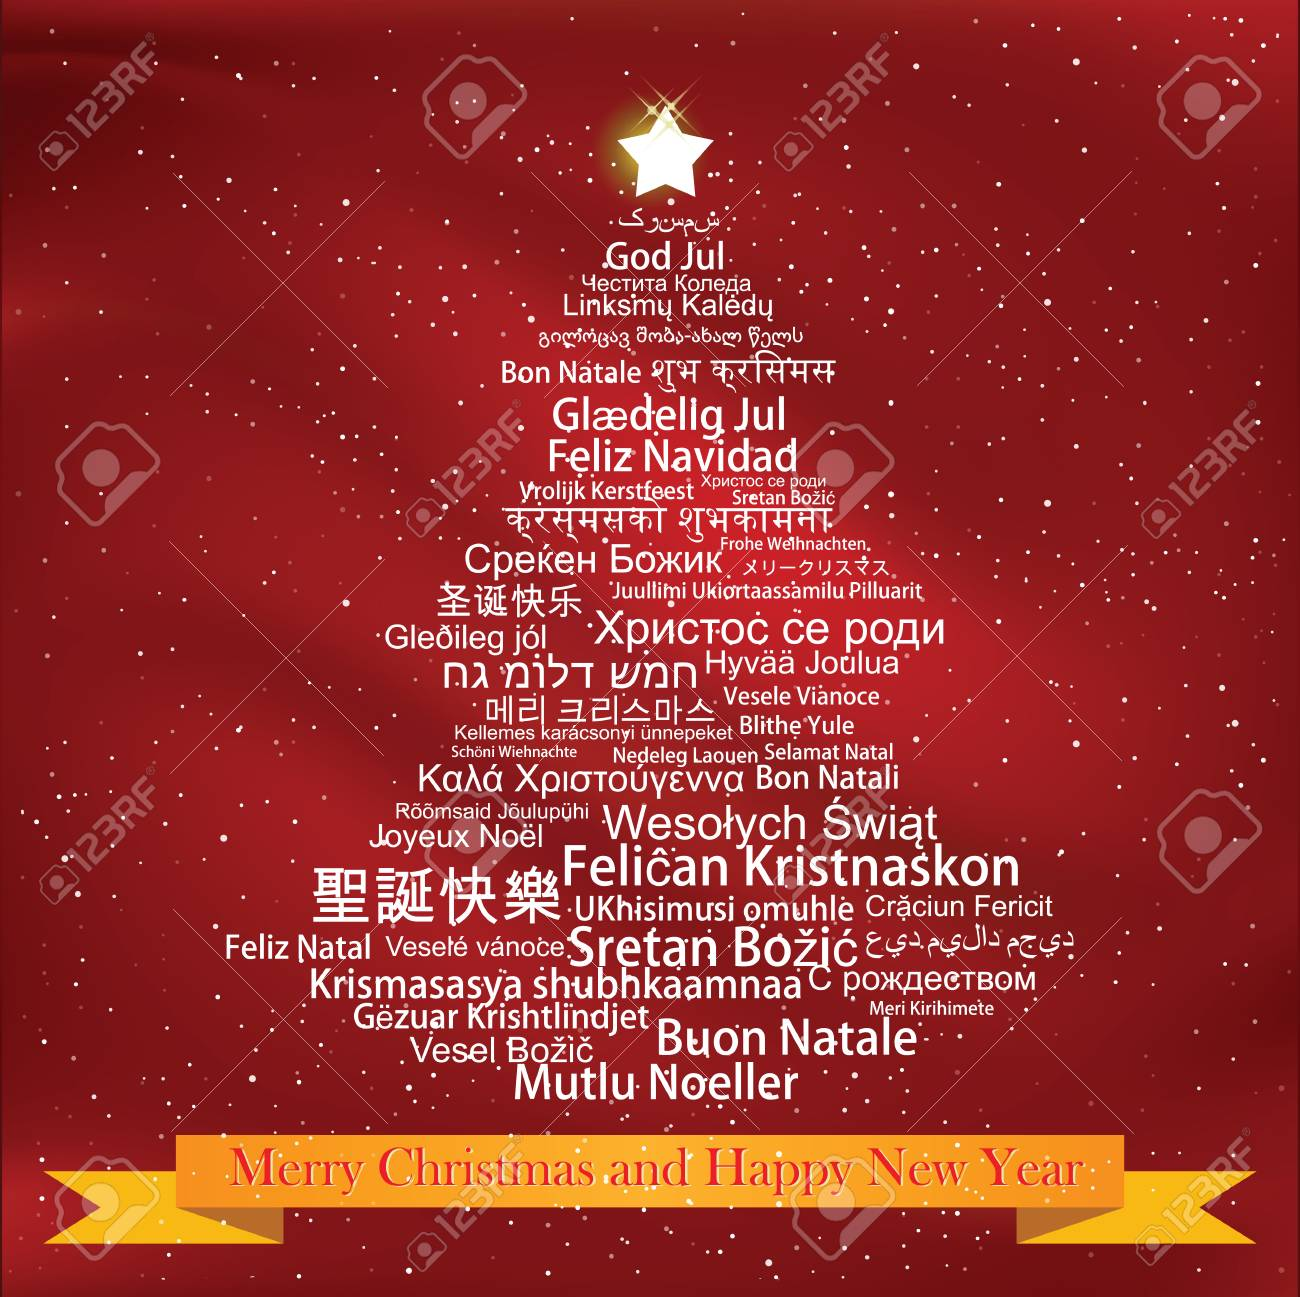 Merry Christmas Tag Cloud shaped as a Christmas tree - 91021991